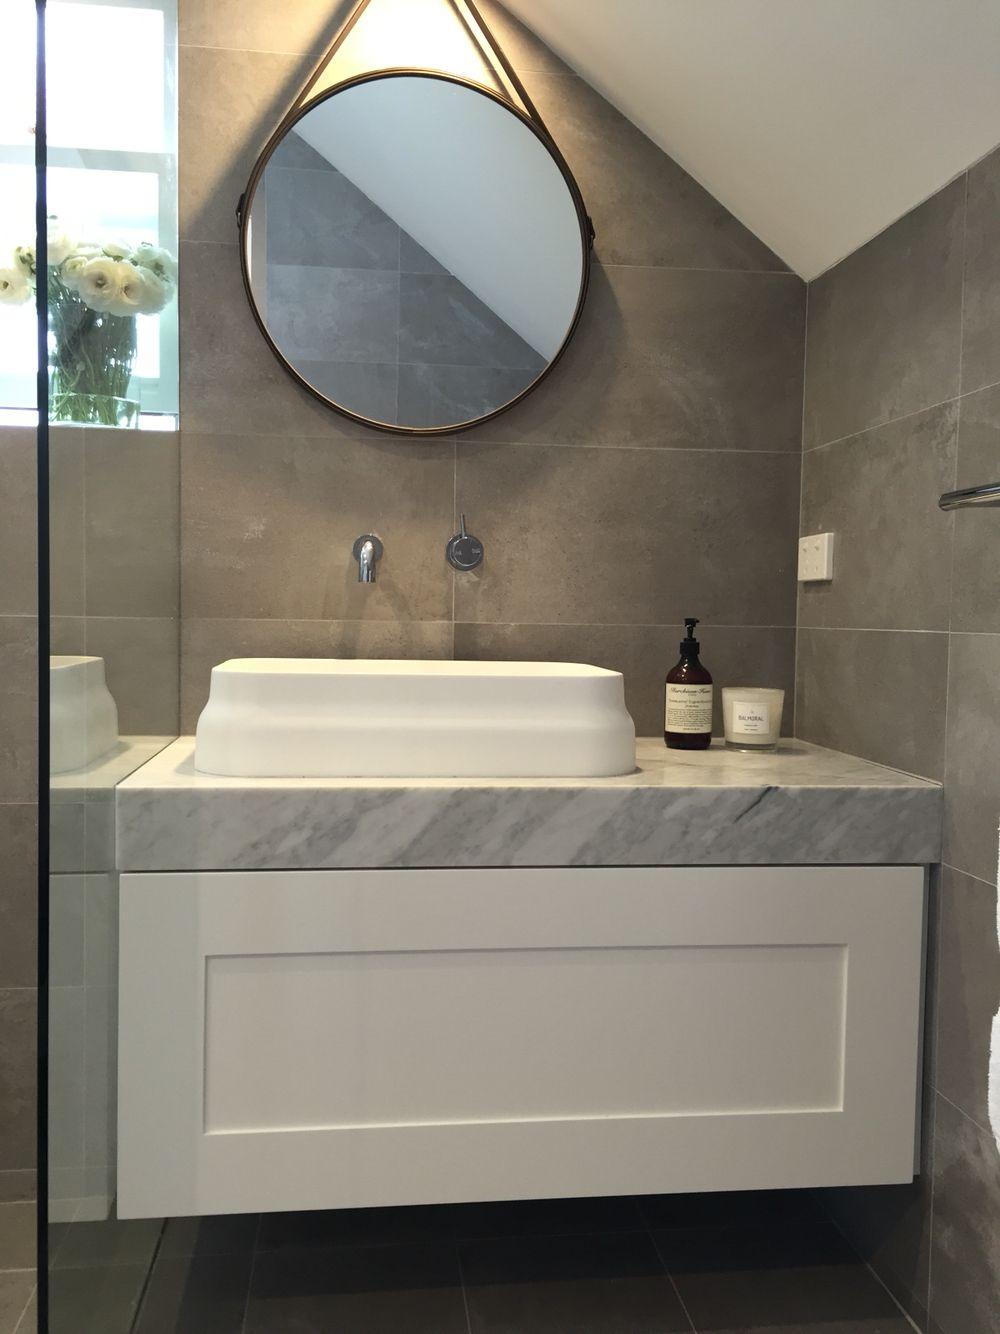 Ensuite Bathroom Grey And White Carrara Marble Vanity Omvivo Basin Omvivo Spout Round